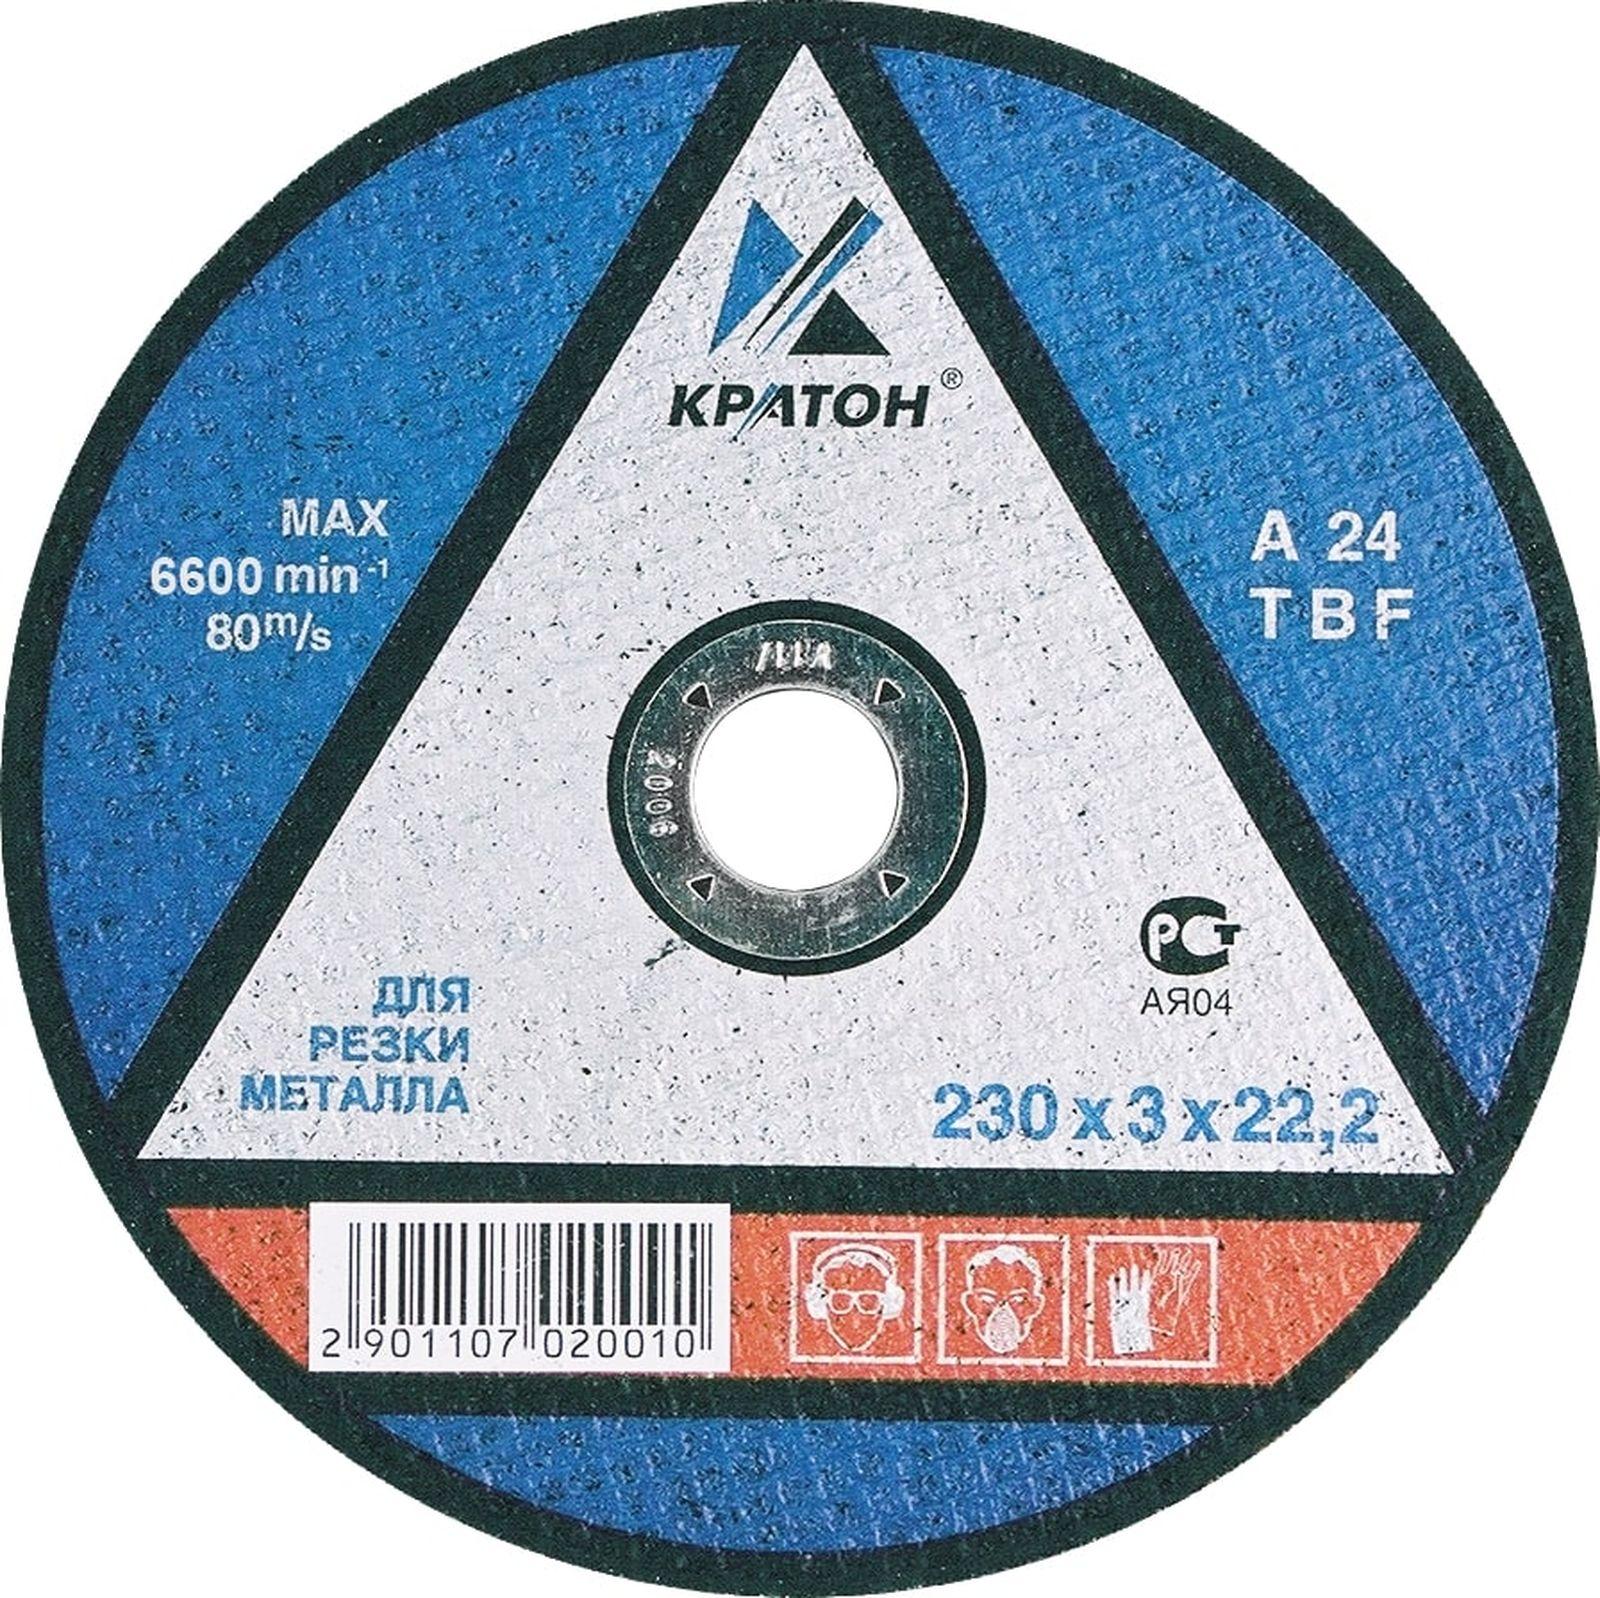 Круг отрезной по металлу Кратон A30TBF, 1 07 02 011, 300 х 32,0 х 3,2 мм круг отрезной по graff по металлу 115 х 1 6 х 22 23 мм